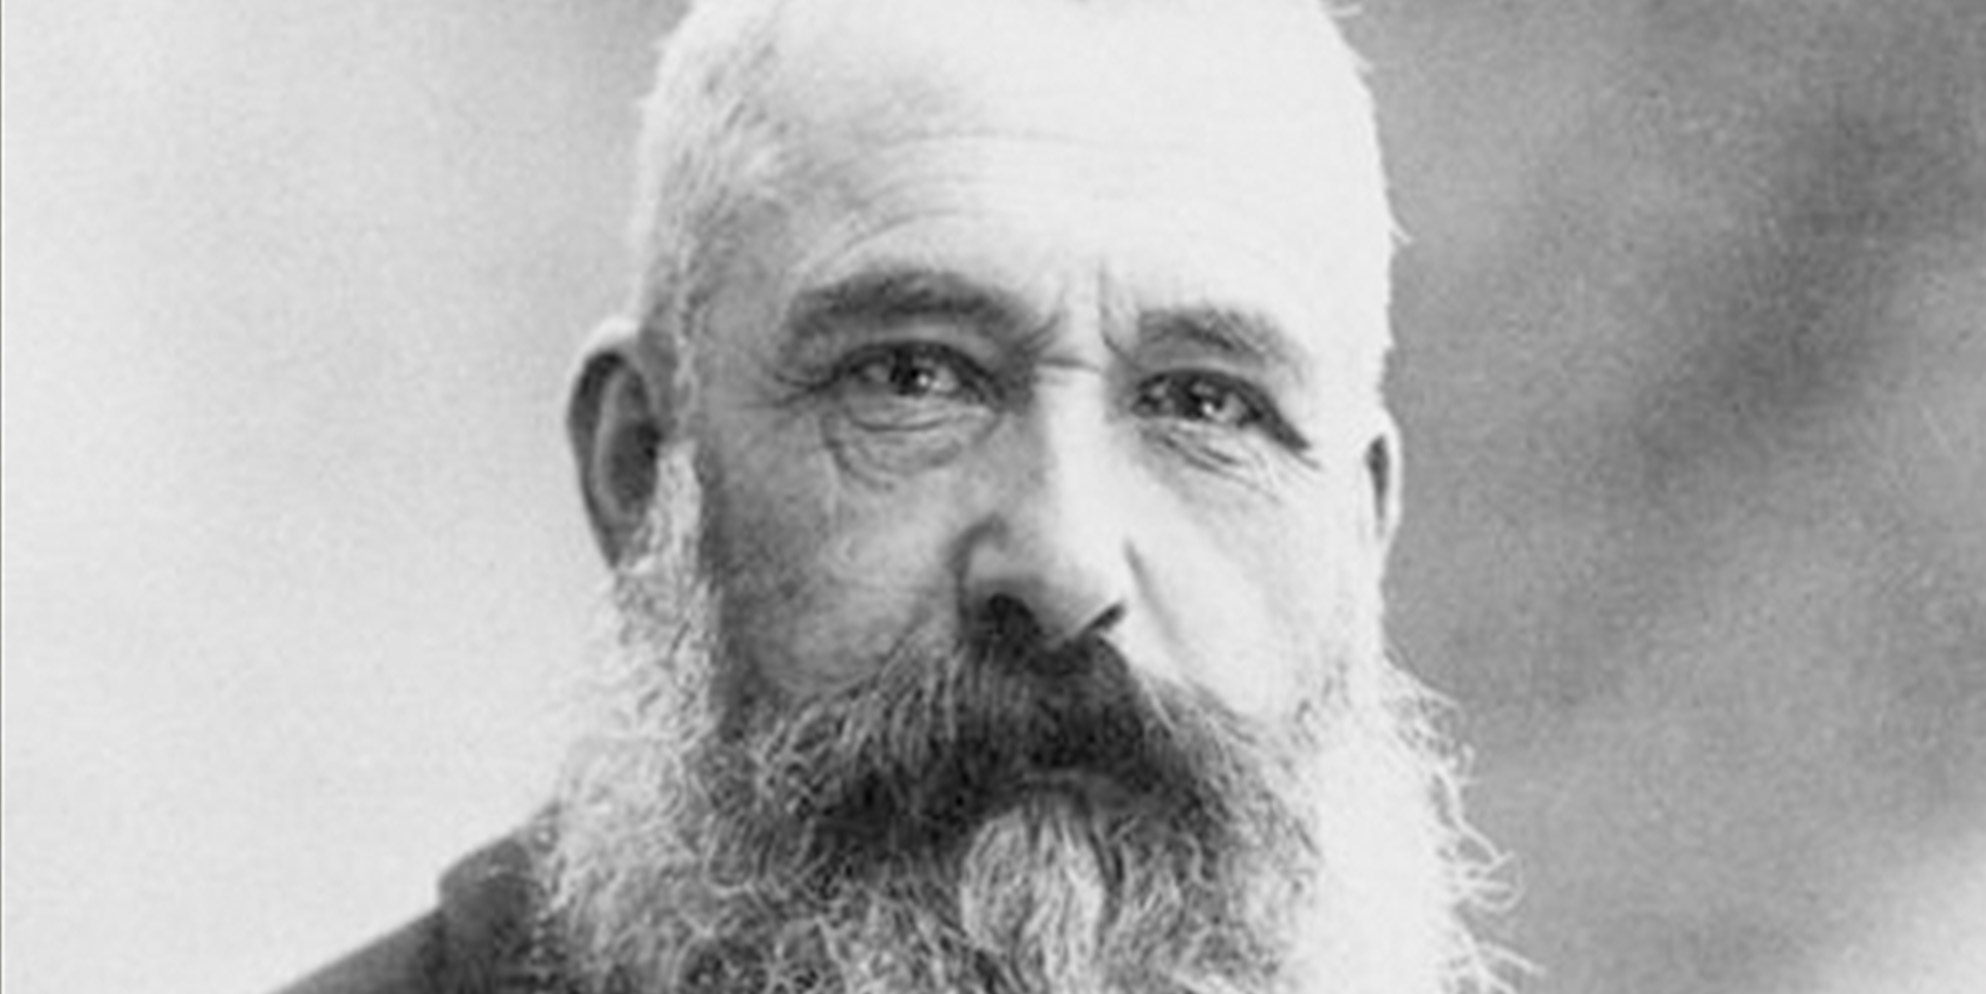 Fondation Claude Monet Chronology